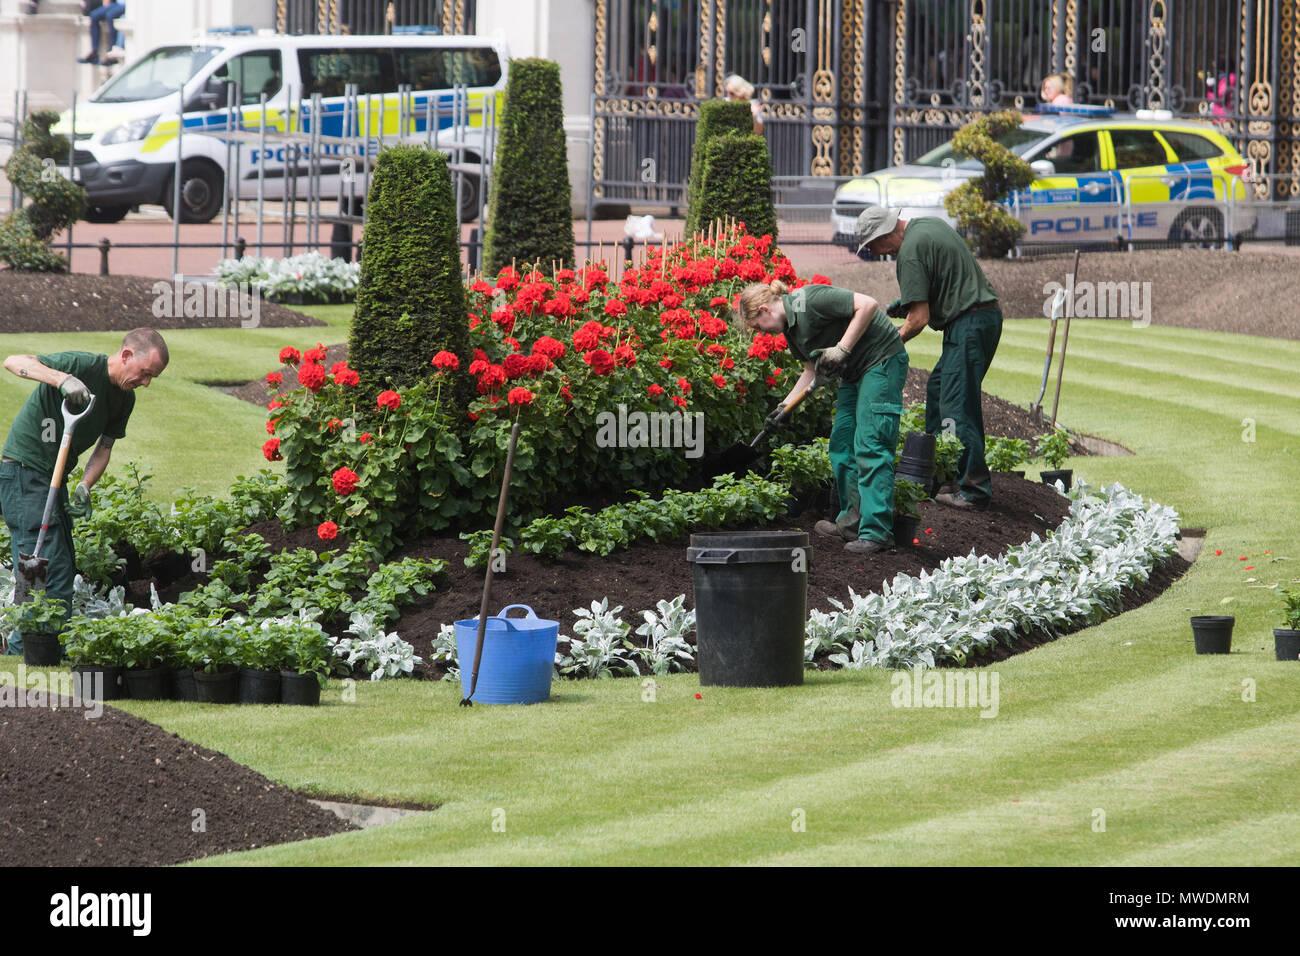 London Uk 1st June 2018 Gardeners Plant Red Geranium Flowers In